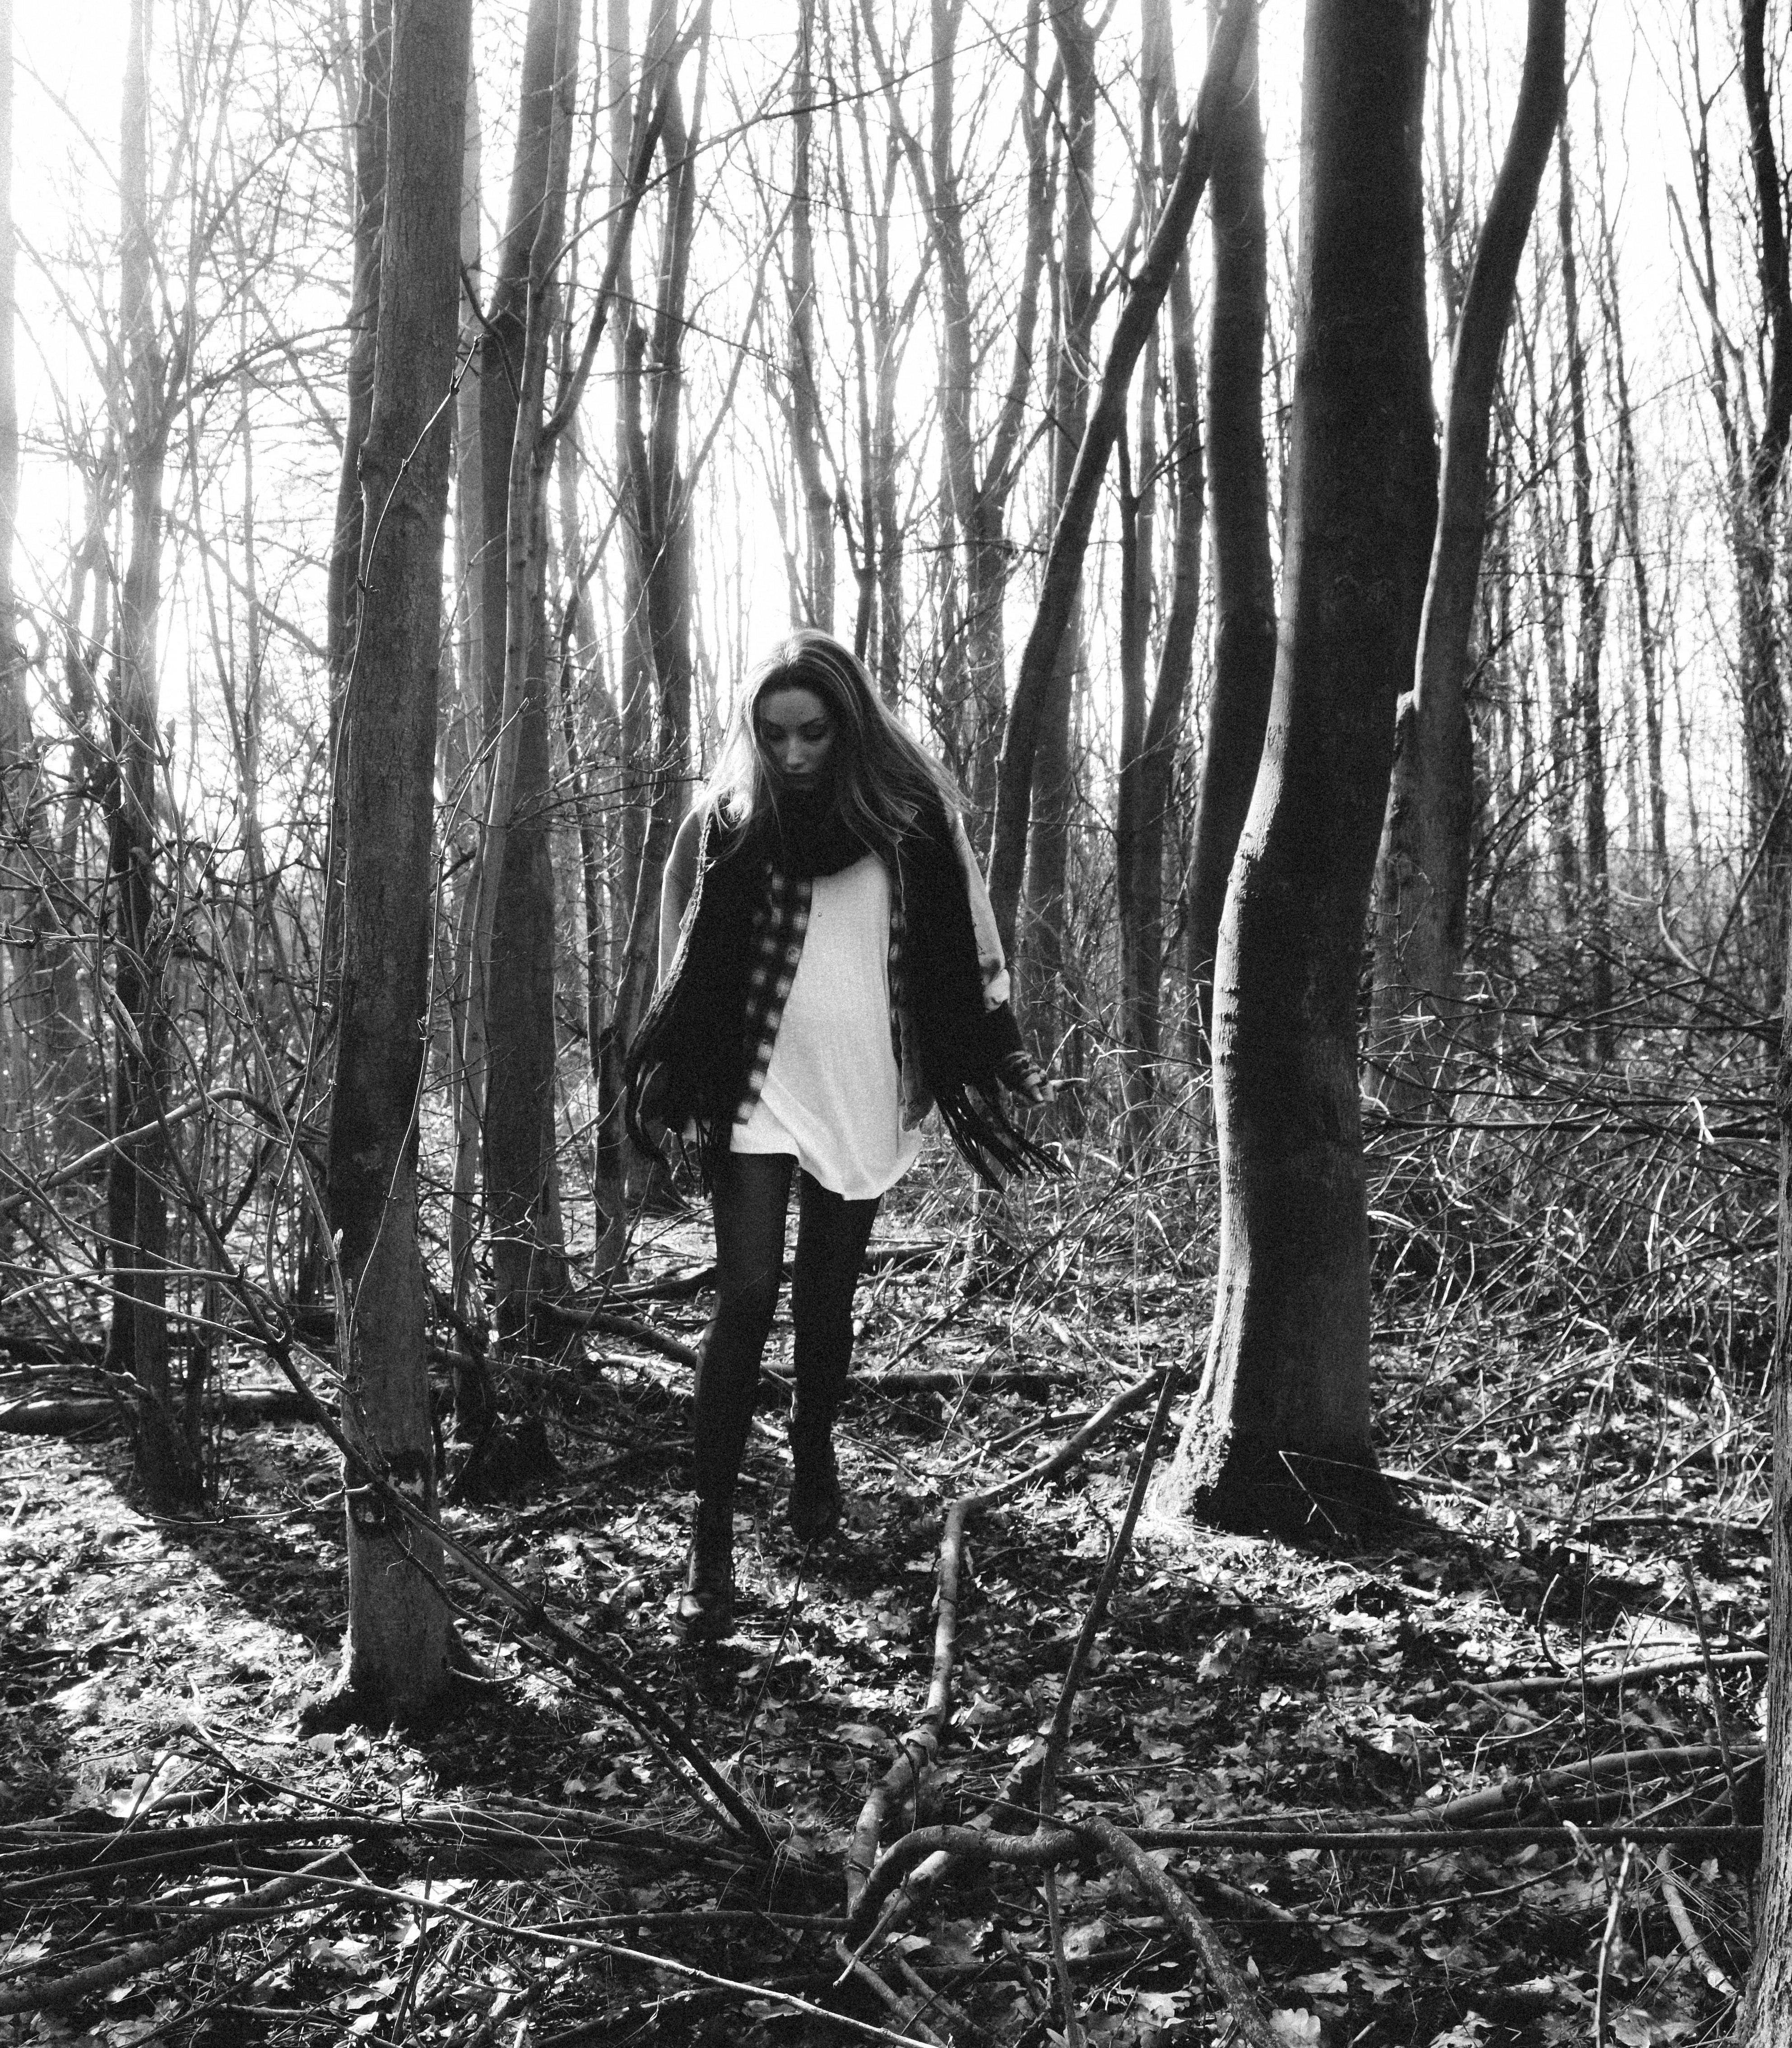 forest-1388.jpg